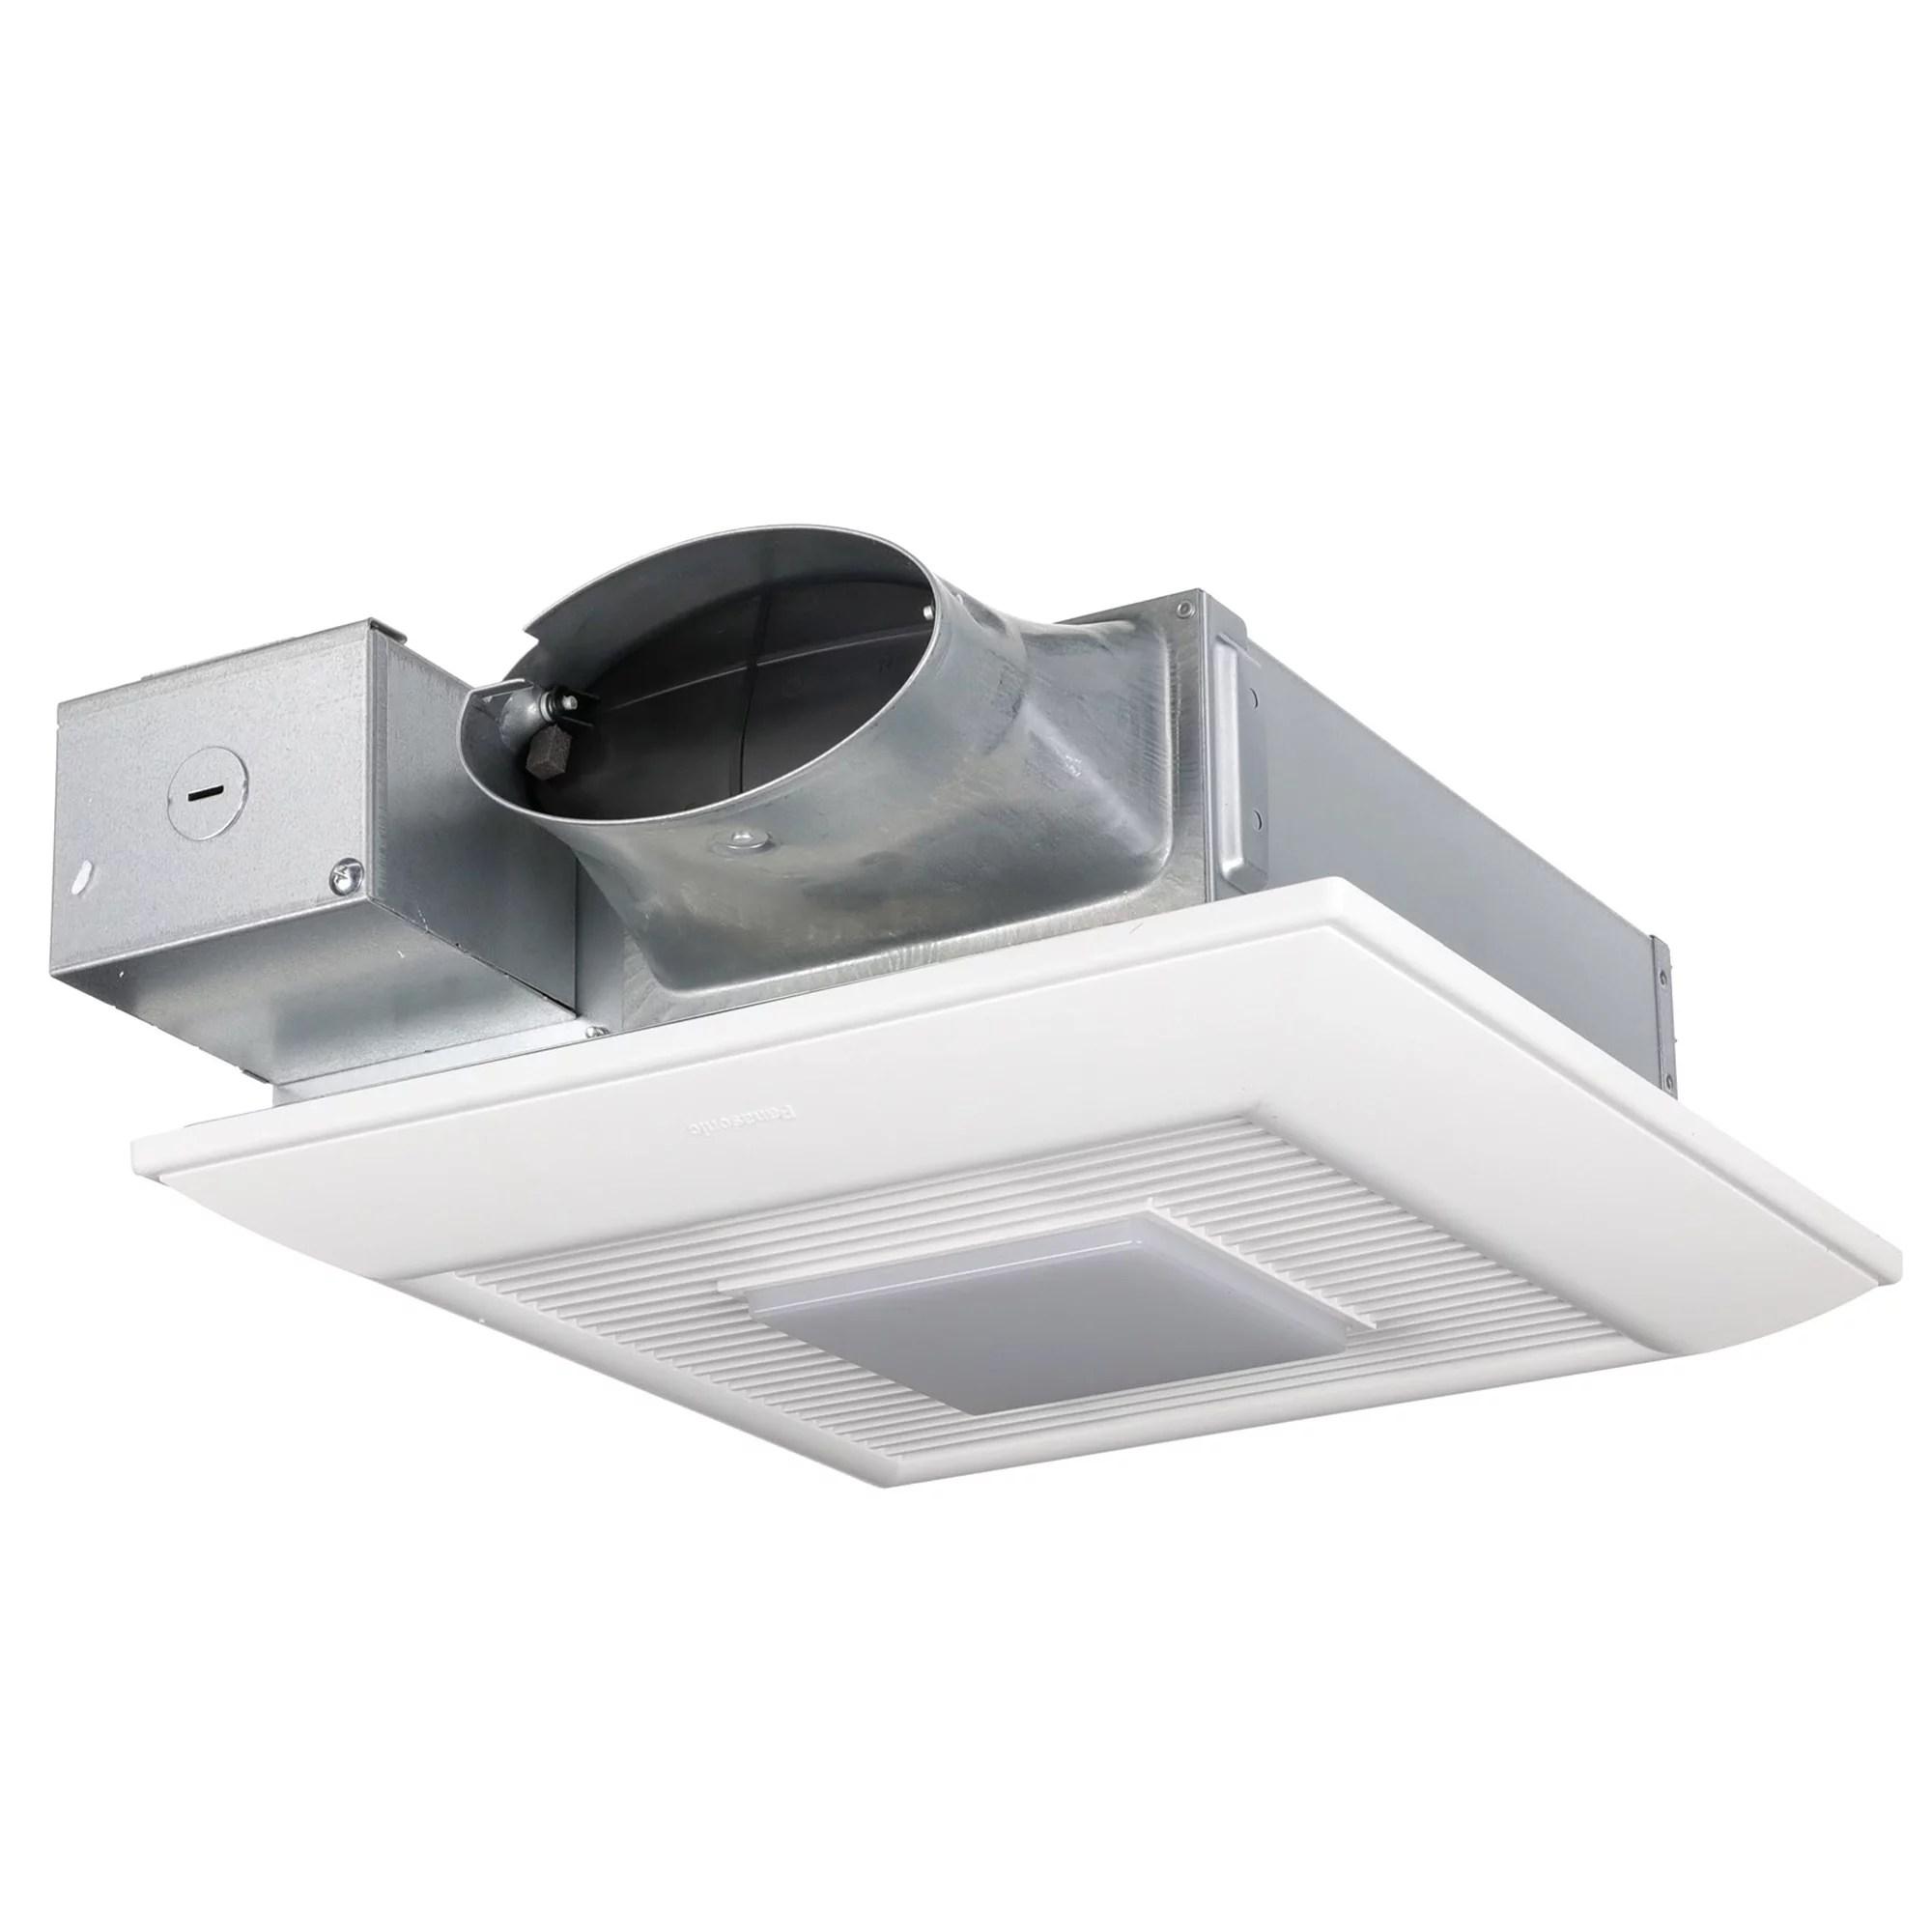 panasonic fv 0510vsl1 whispervalue dc ventilation fan light speed selector low profile quiet walmart com